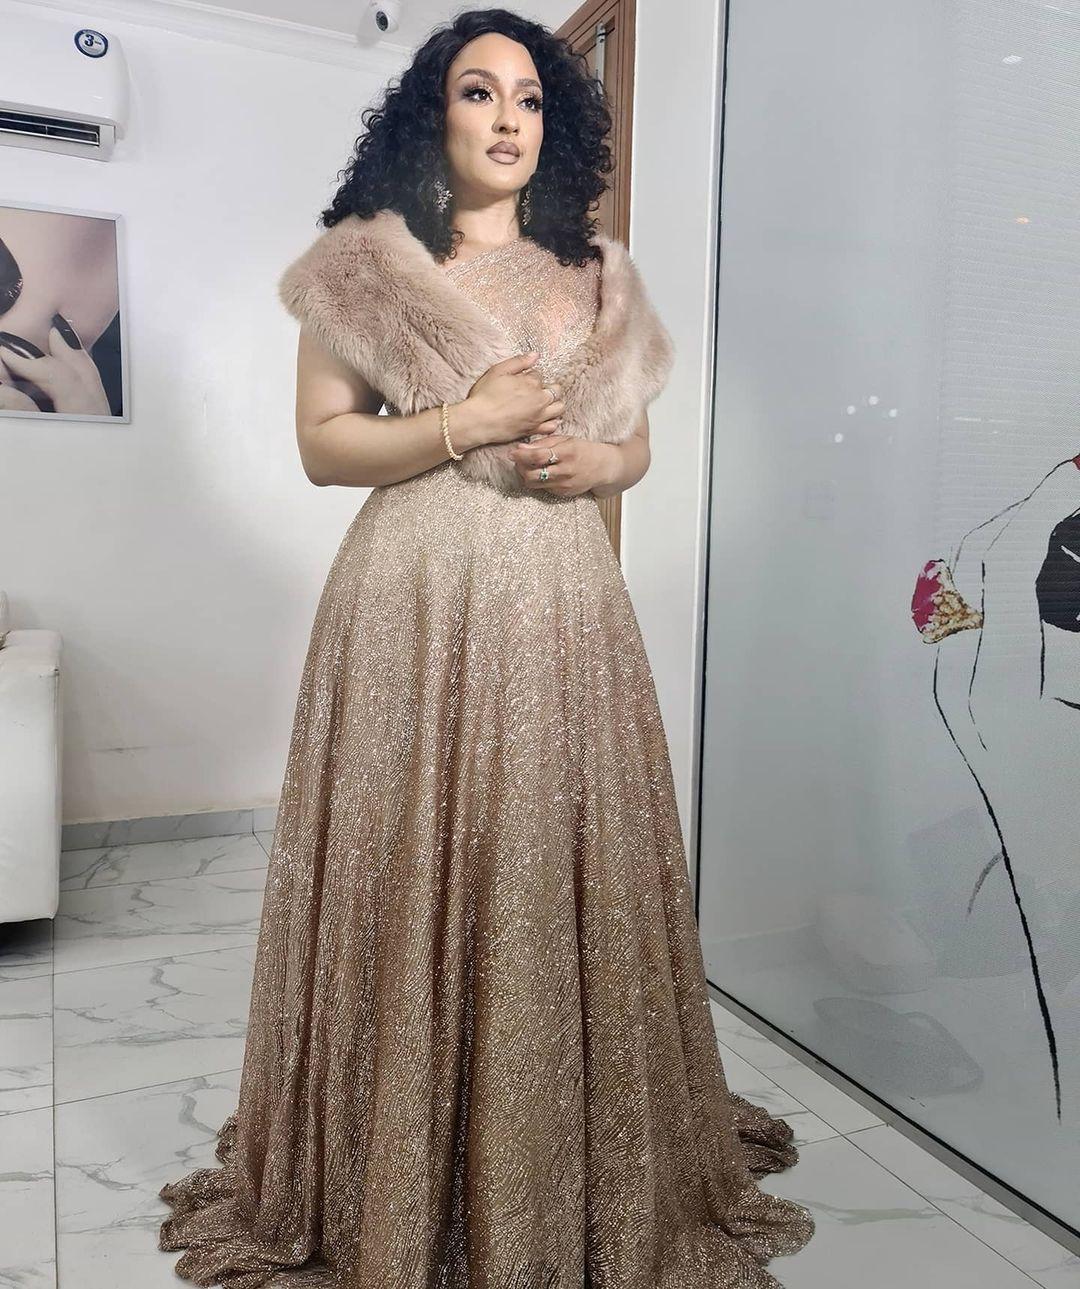 Rosemary Afuwape instagram fashion